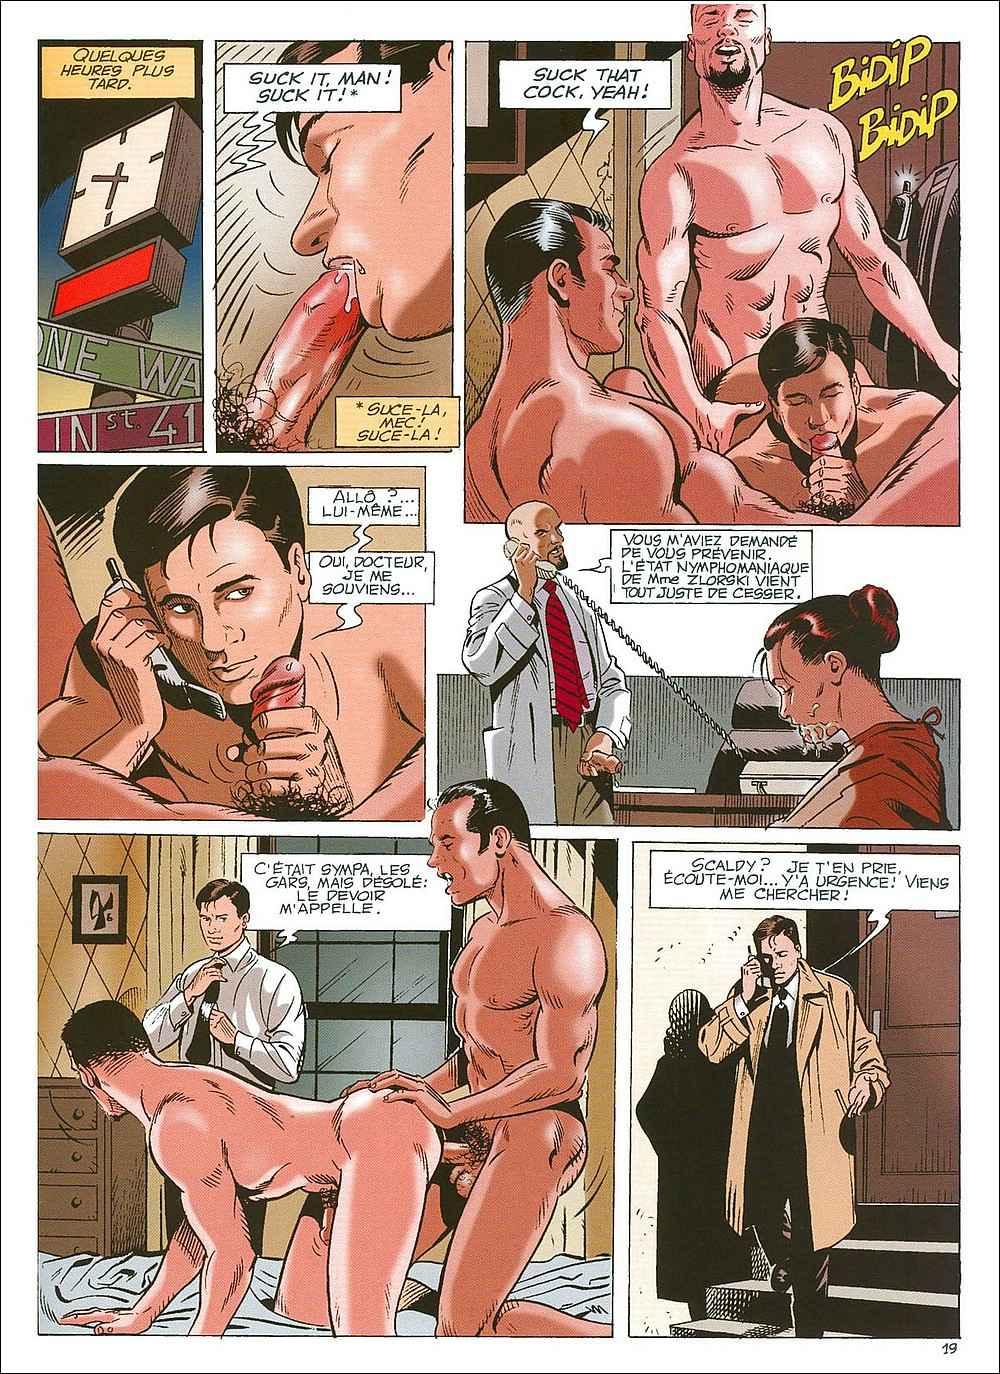 Selma and patty lesbian porn pics